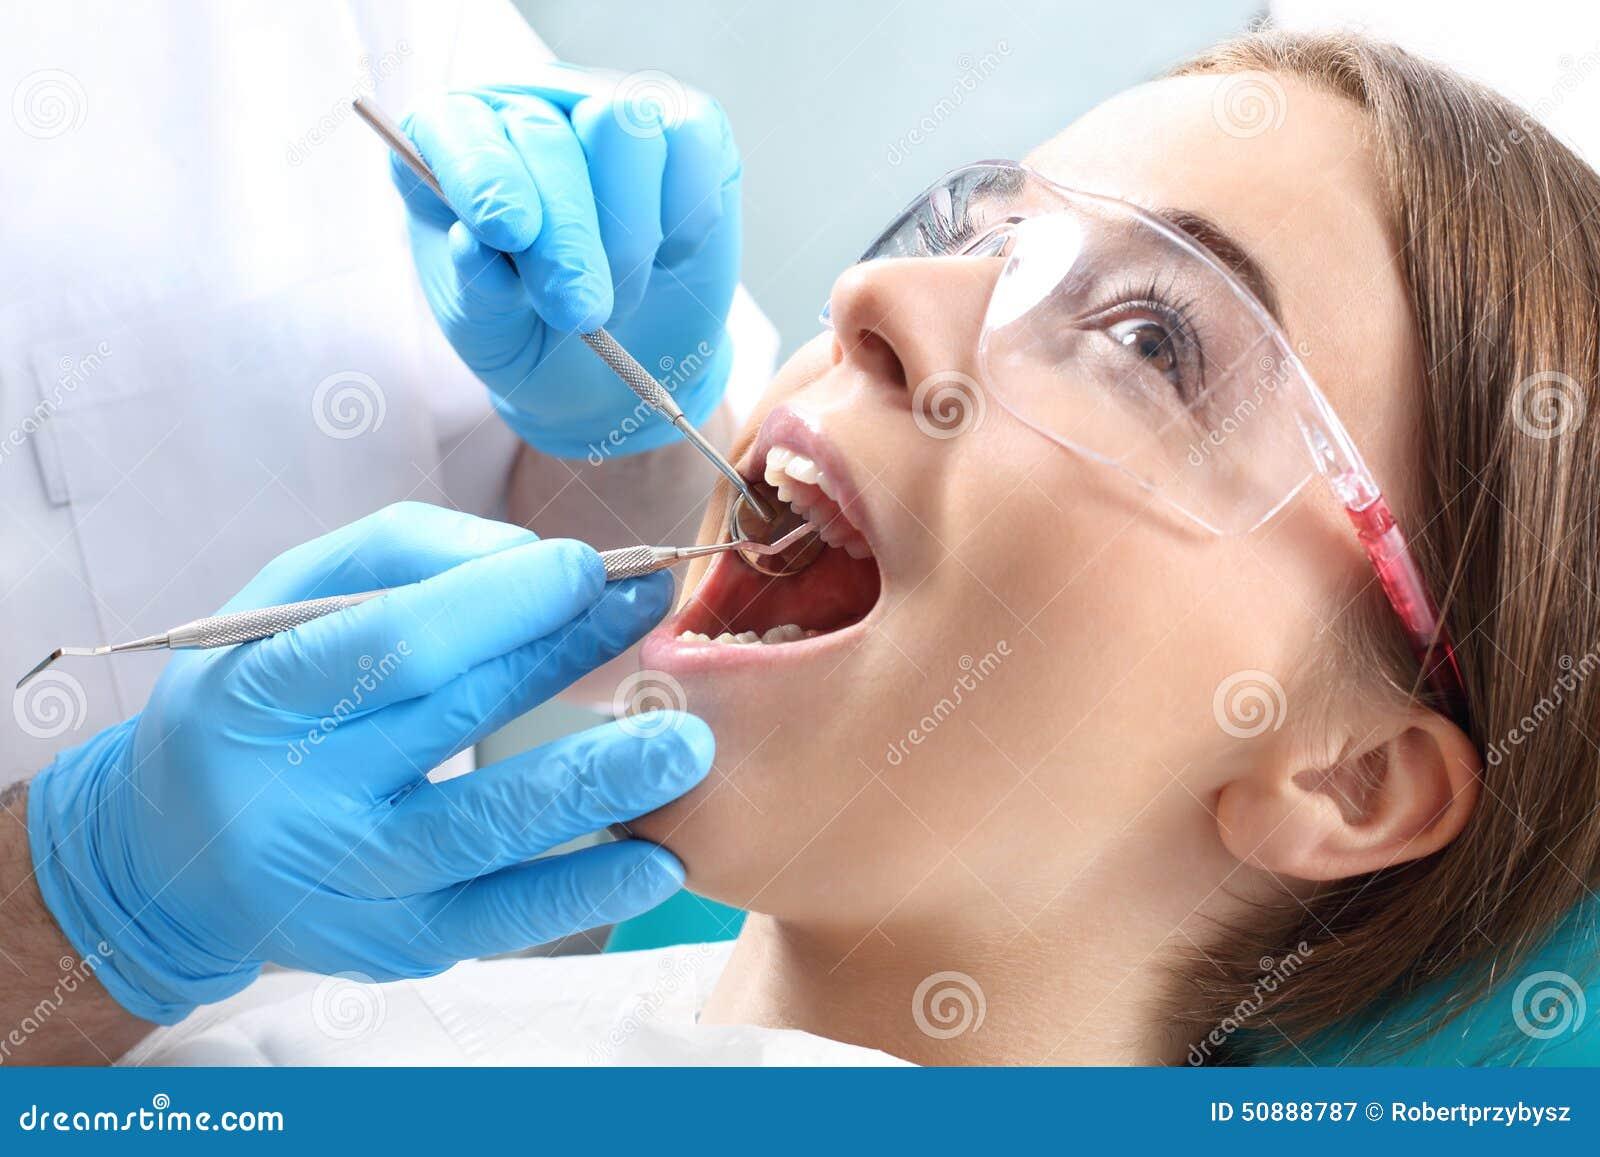 Beskådad muntlig hygien